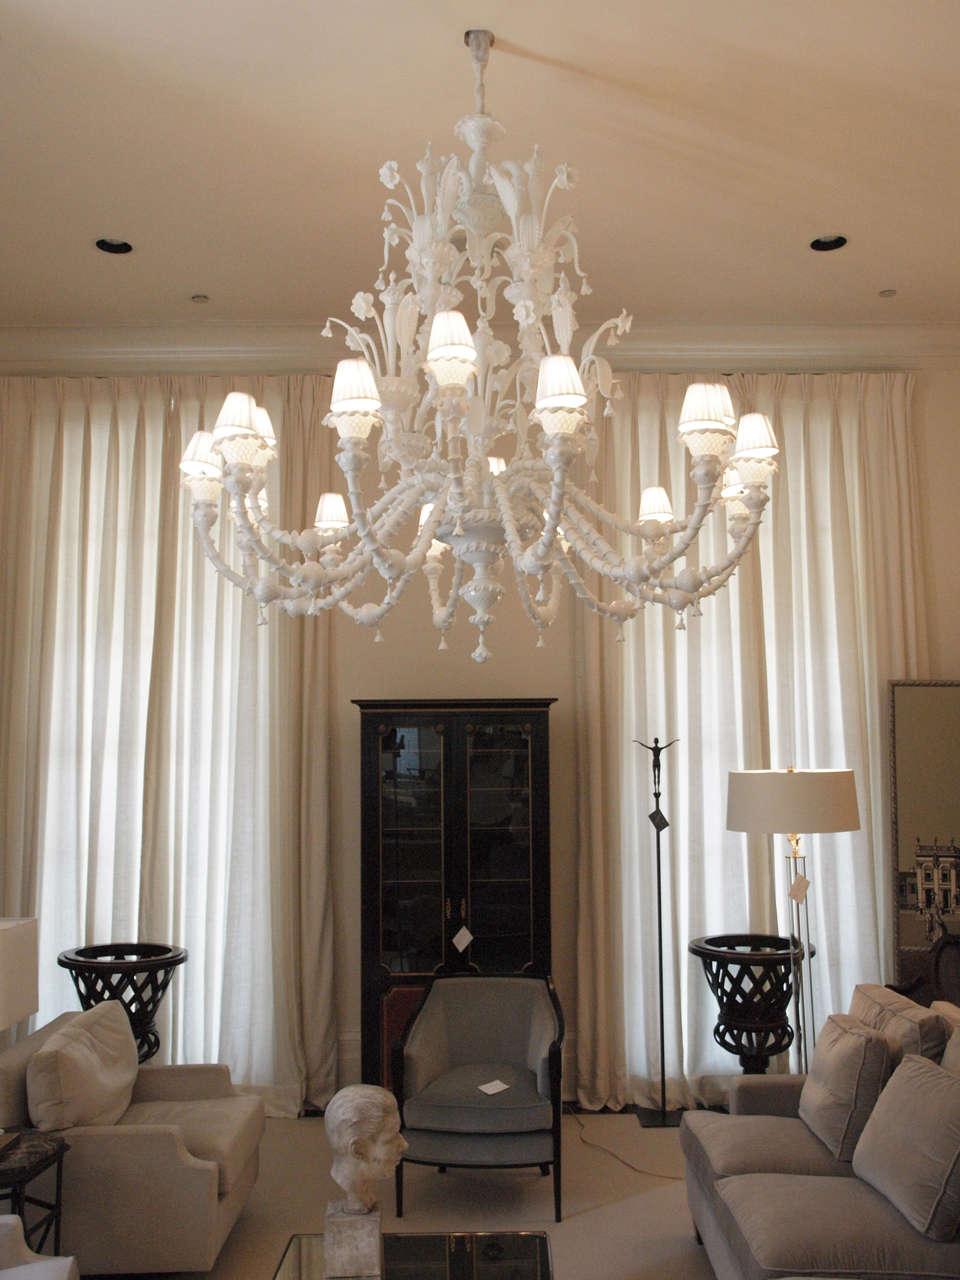 Saturday sale enormous milk glass murano 16 light chandelier at 1stdibs arubaitofo Choice Image